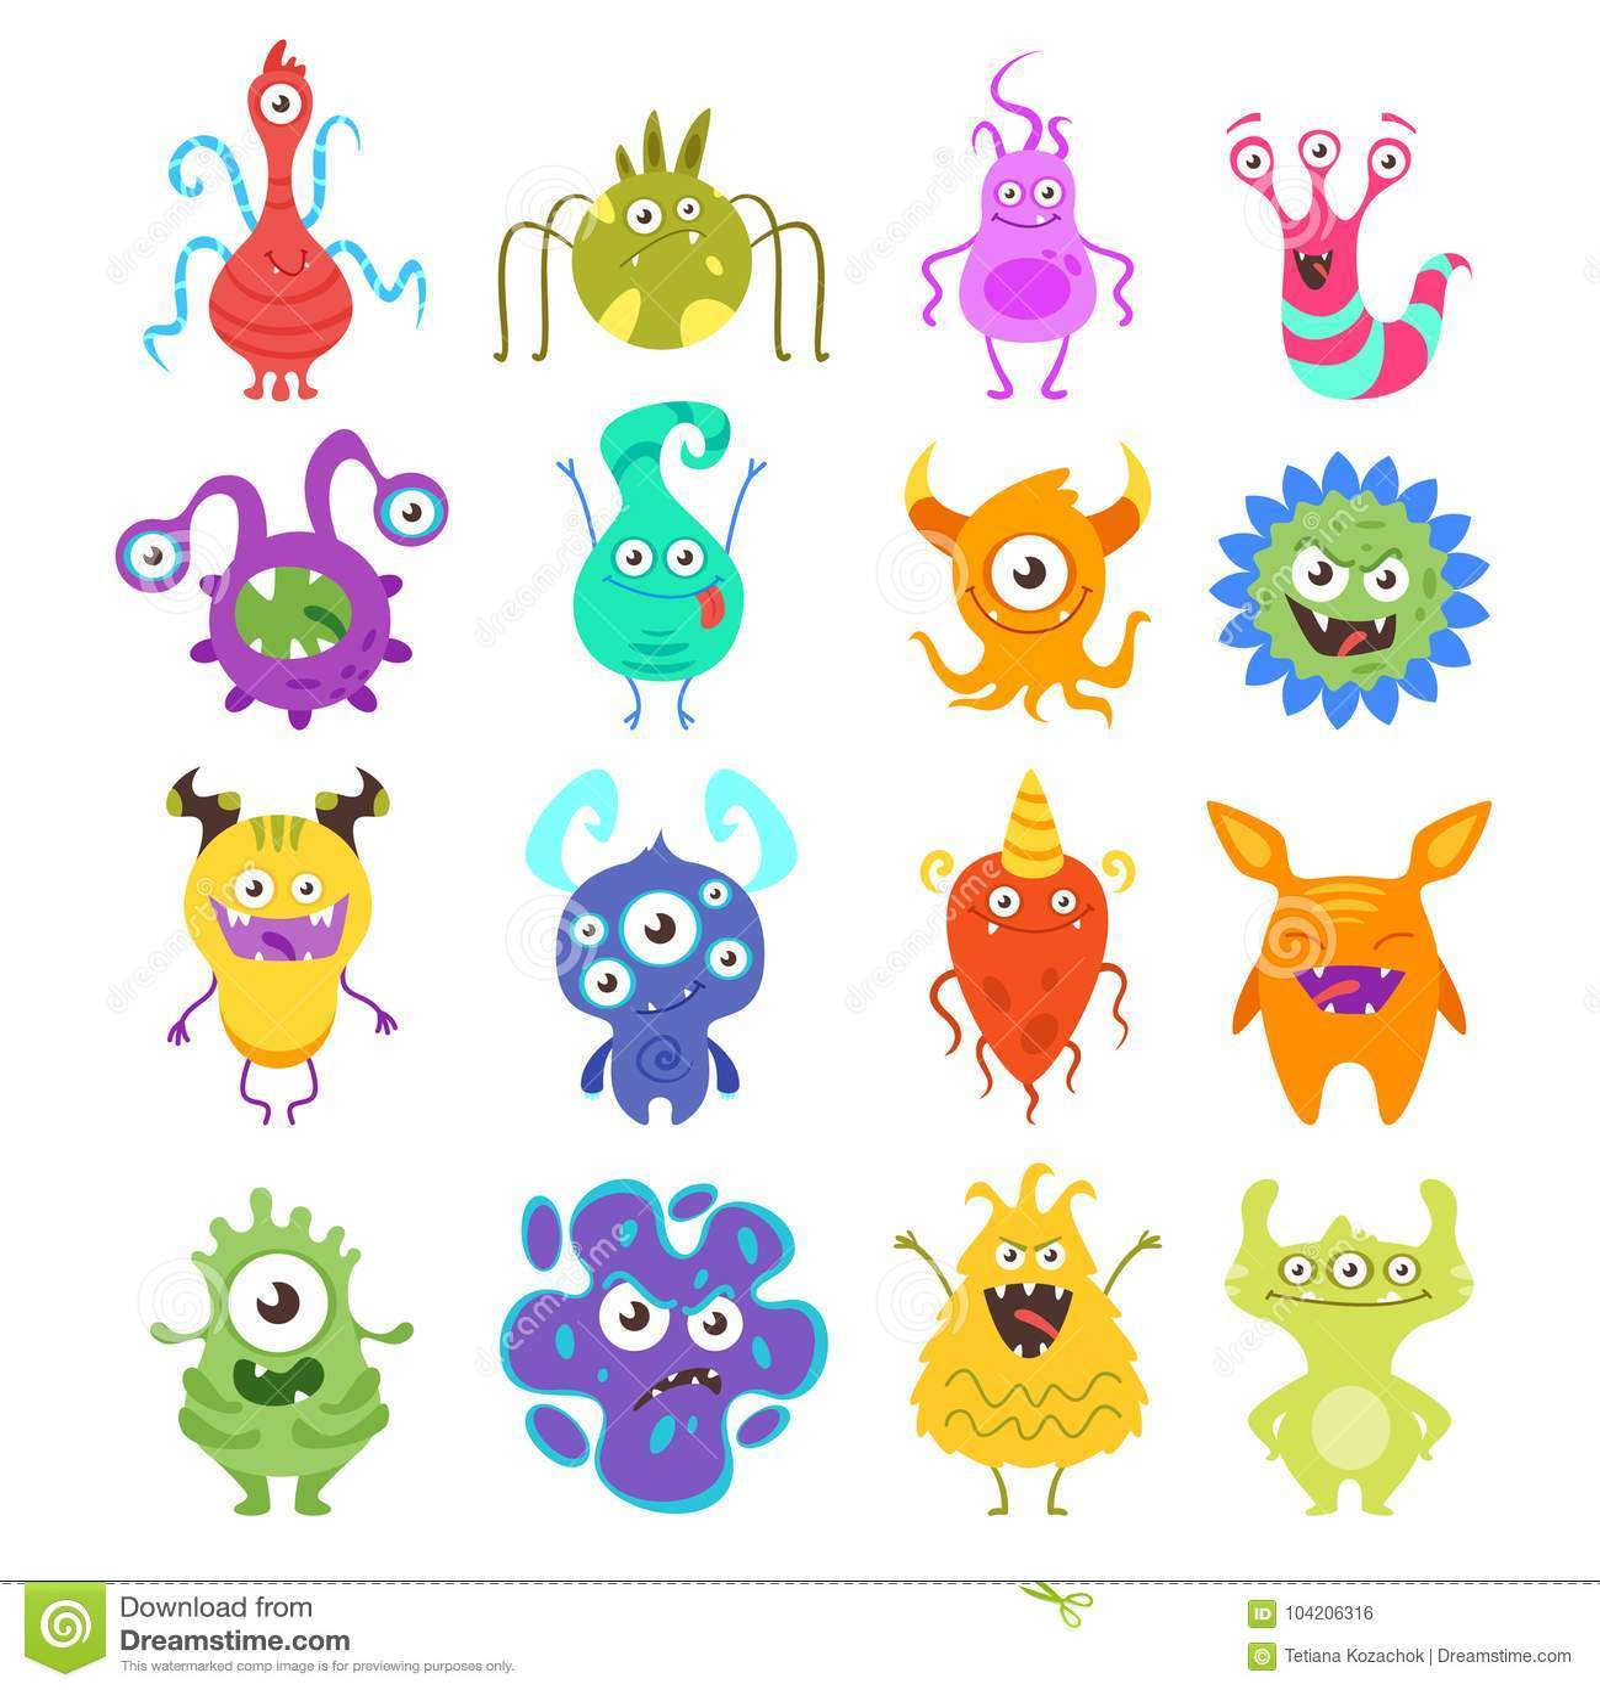 Colorful Bacteria Clip Art